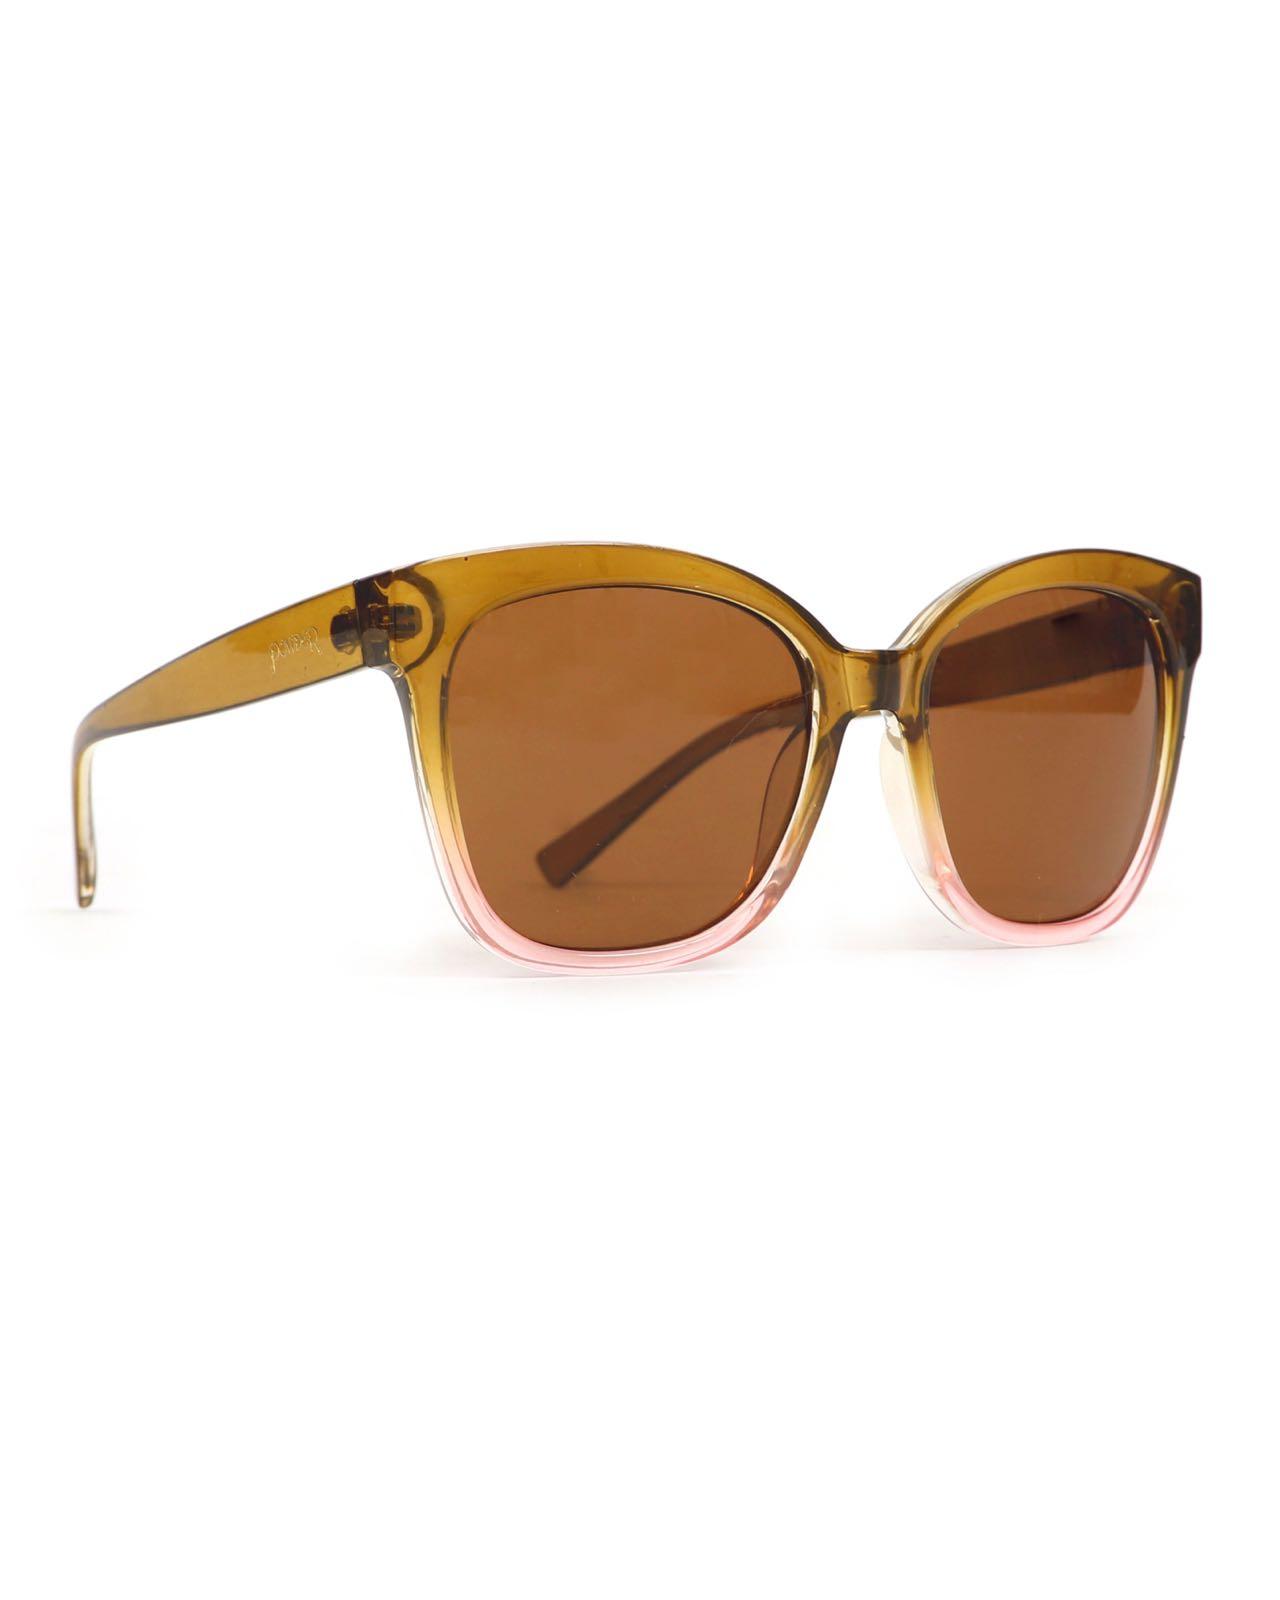 Powder Marcia sunglasses